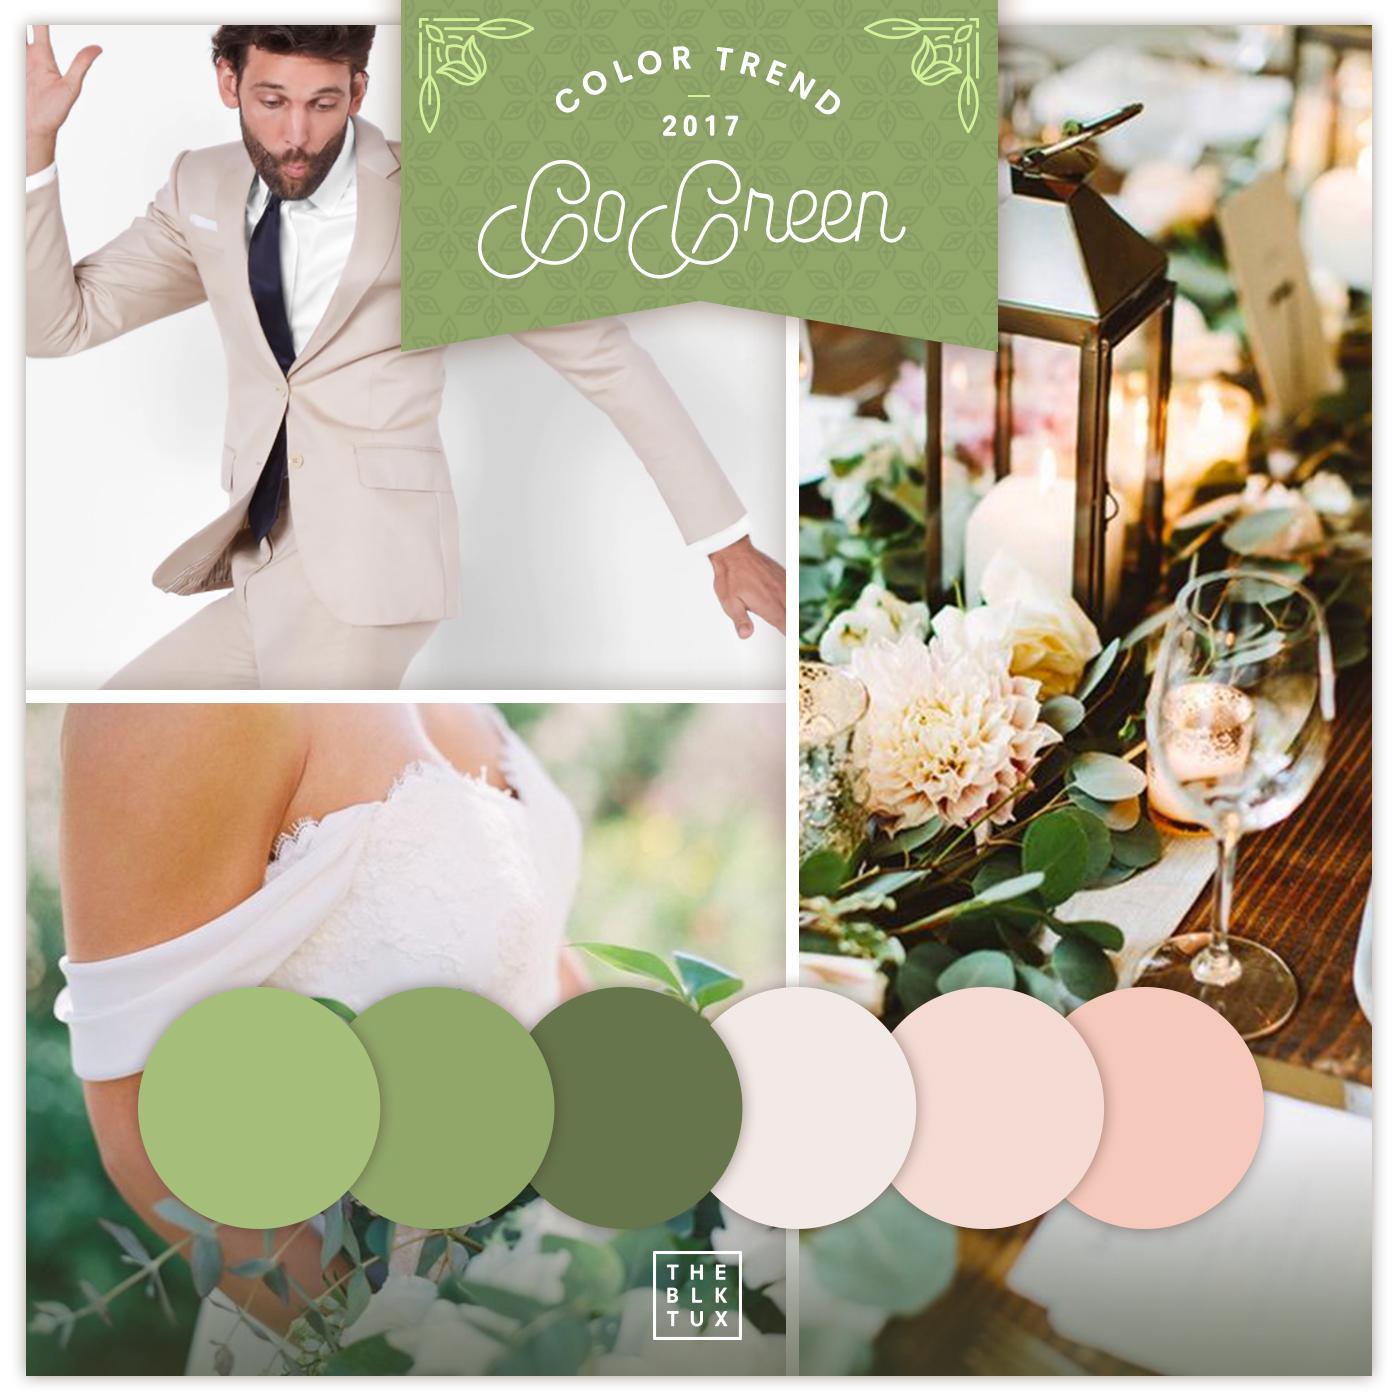 blktux_wedding_color_trends_green_x2_v02